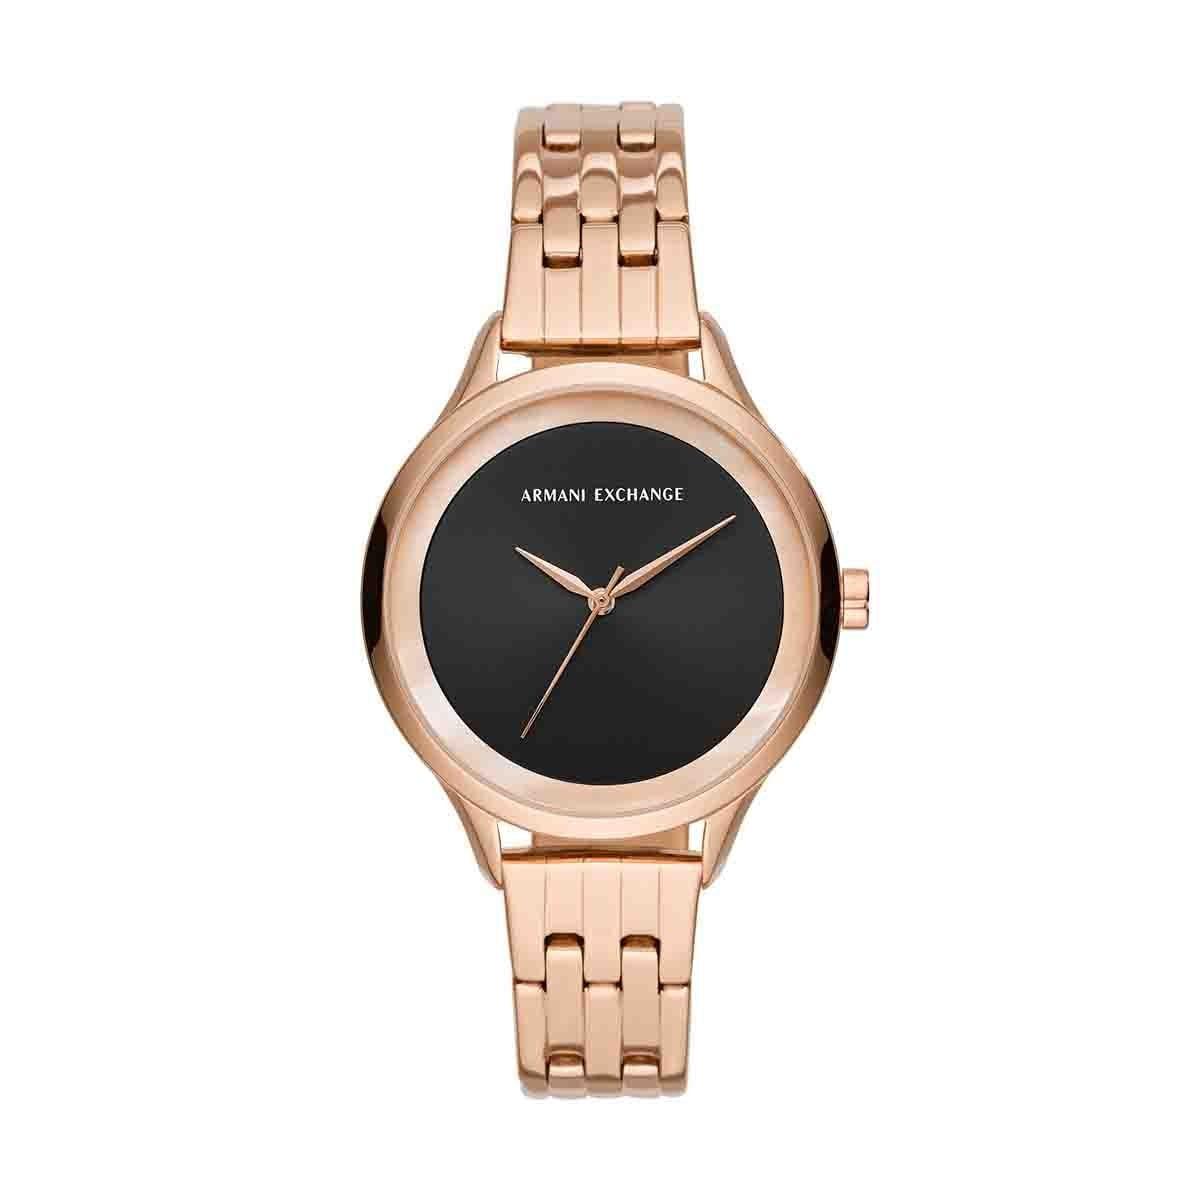 f8d79282d3f8 Reloj para dama color oro rosado armani exchange